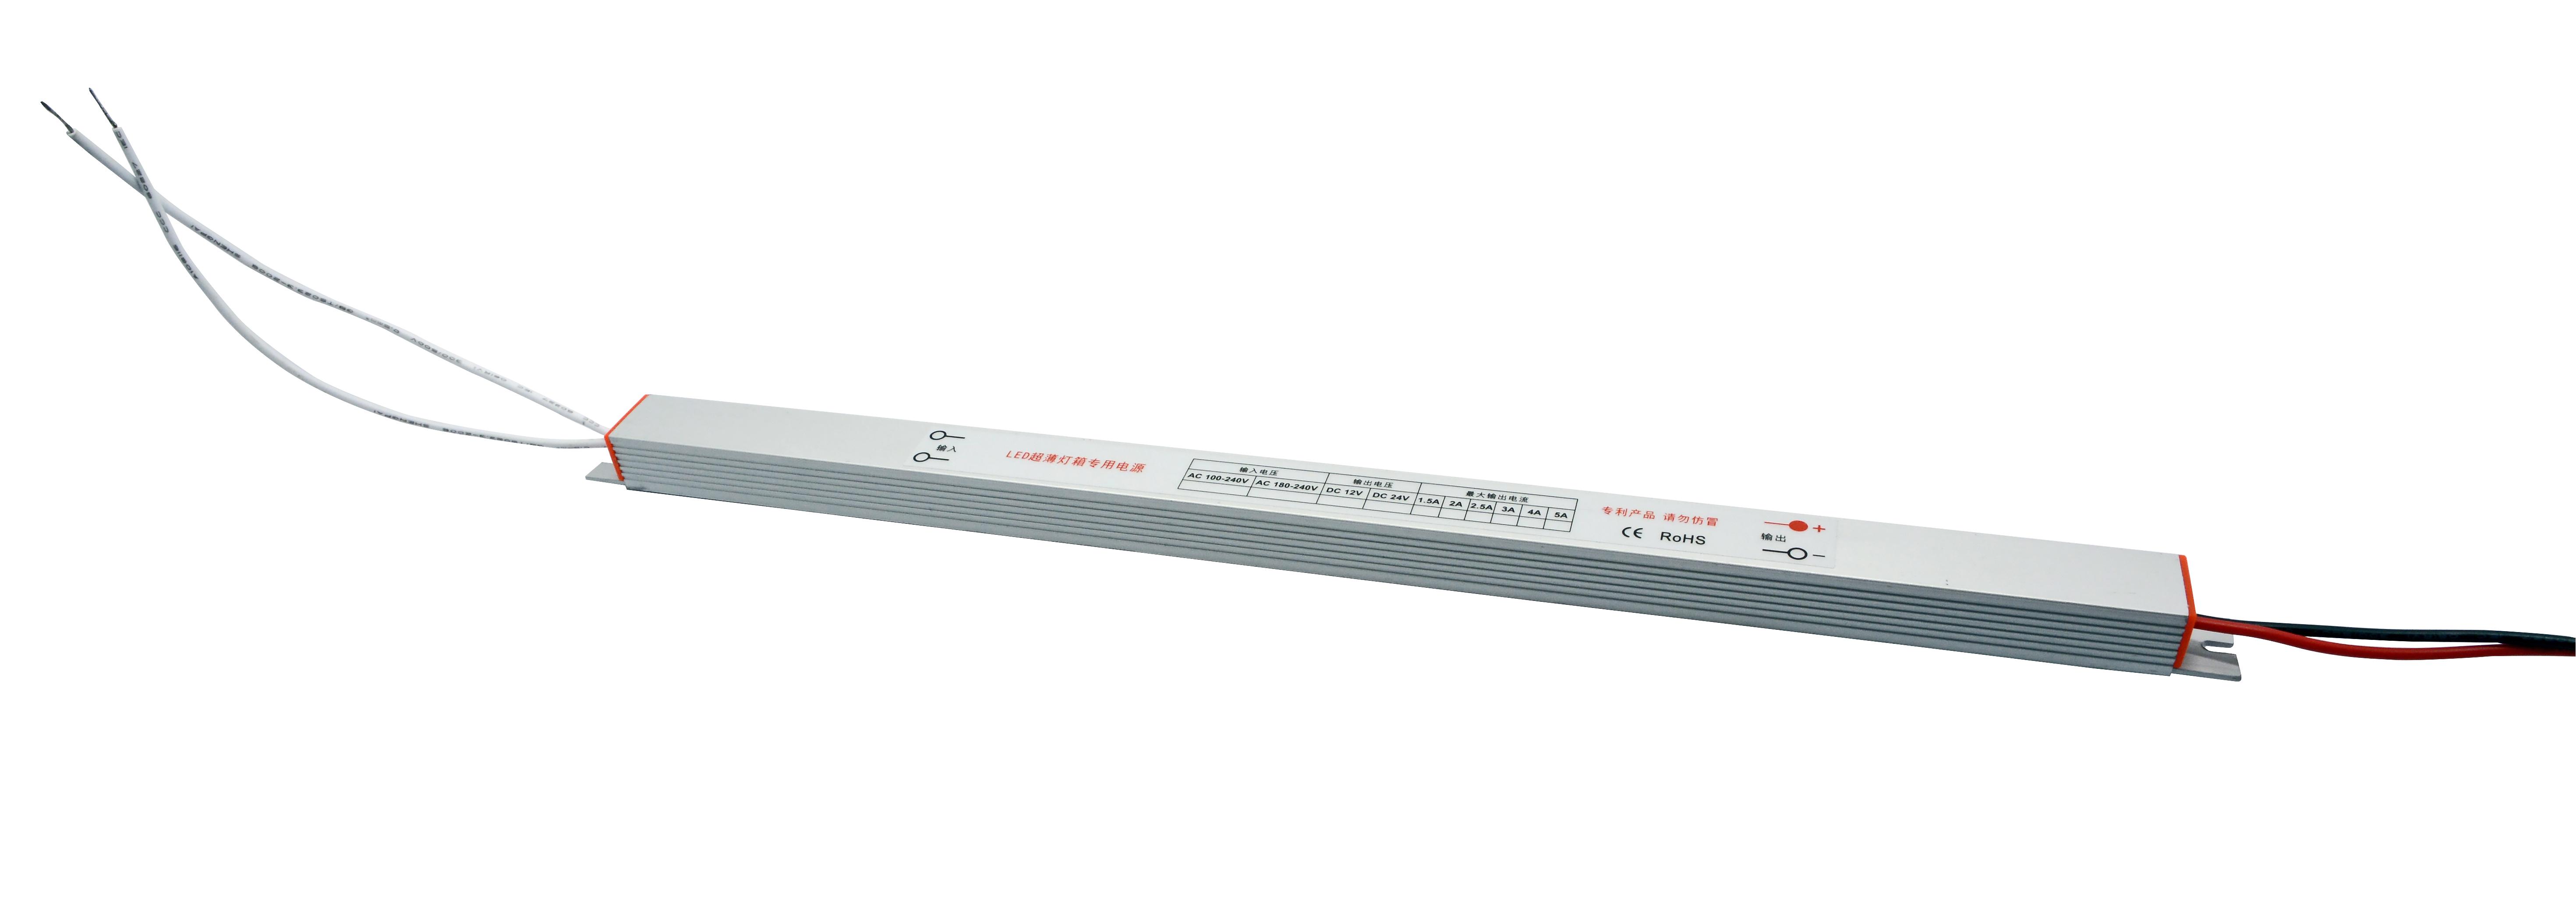 Led 超薄宽压细长条电源12V60W